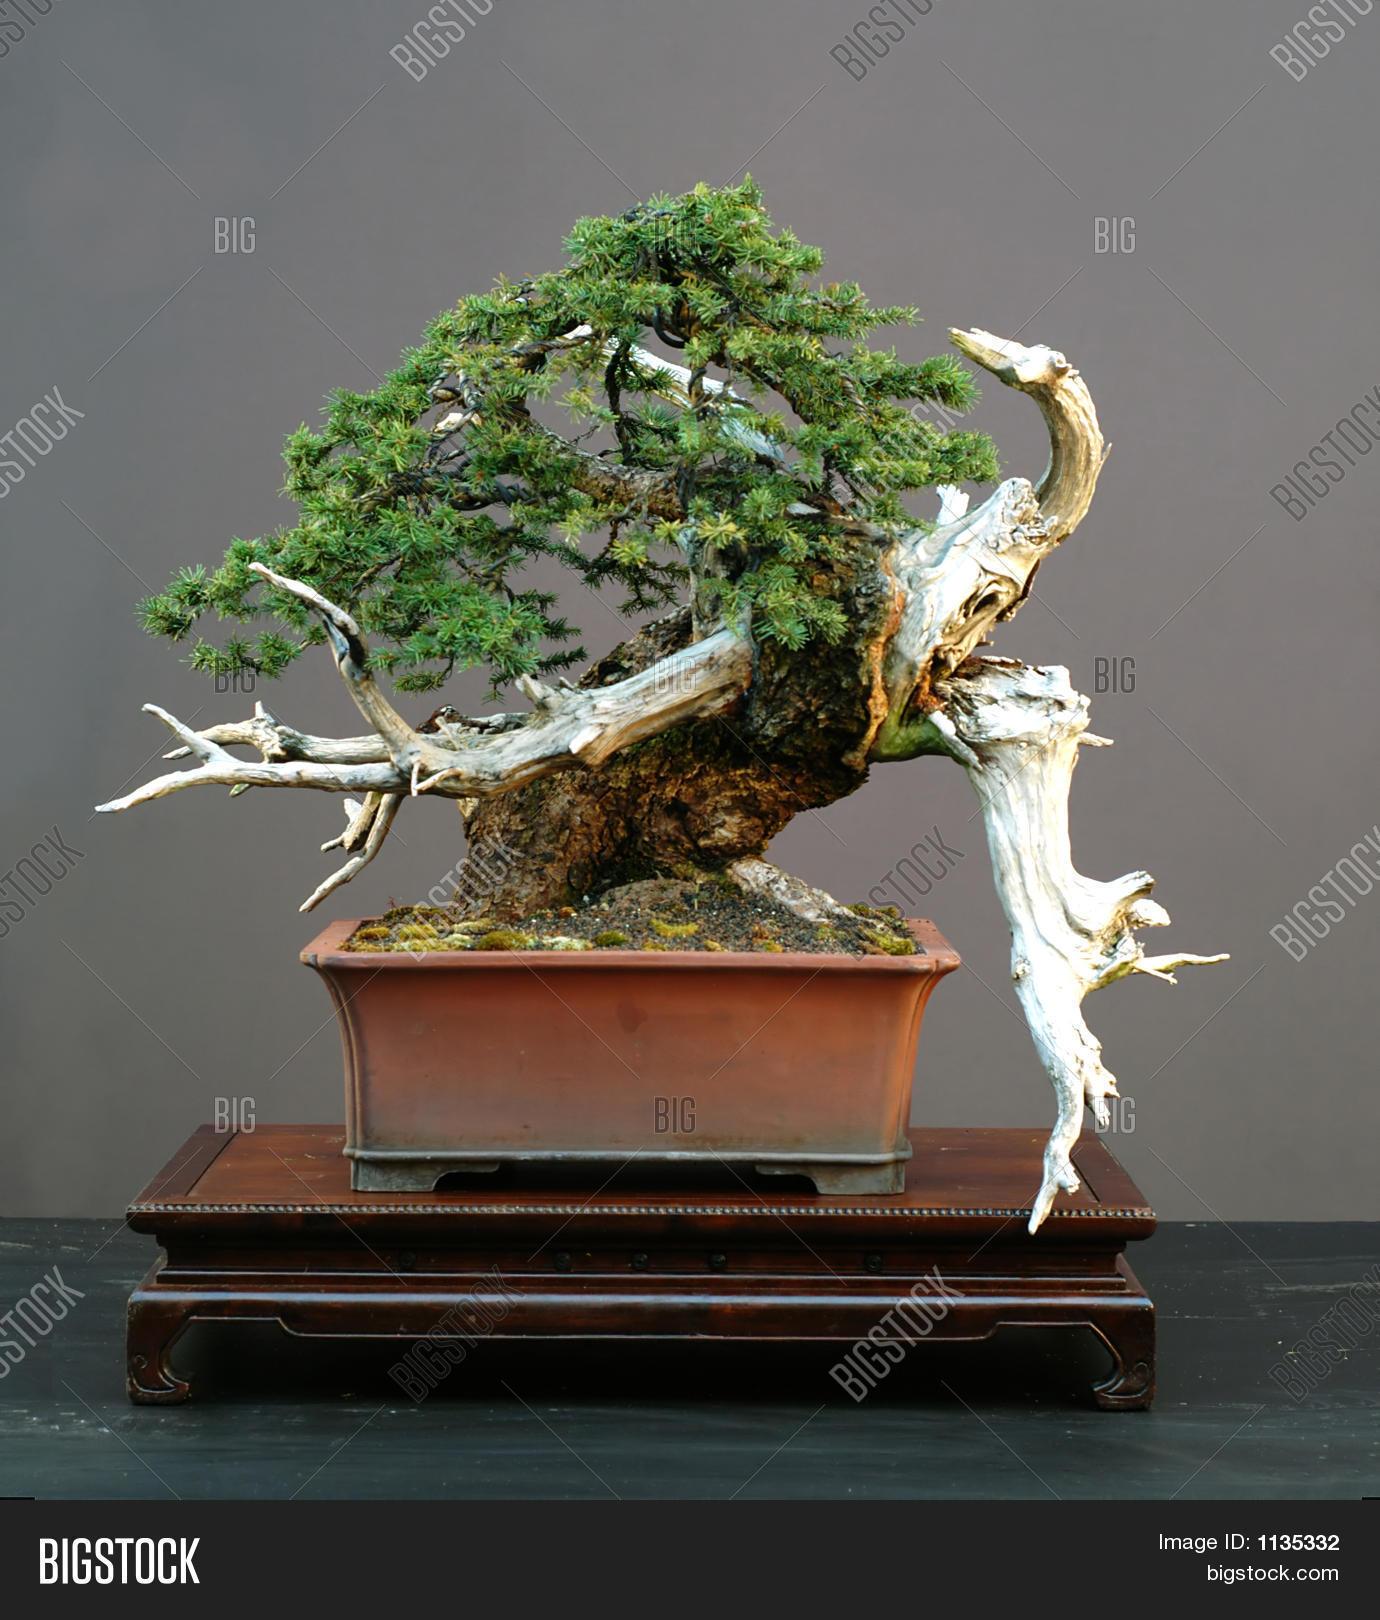 Spruce Bonsai Image Photo Free Trial Bigstock